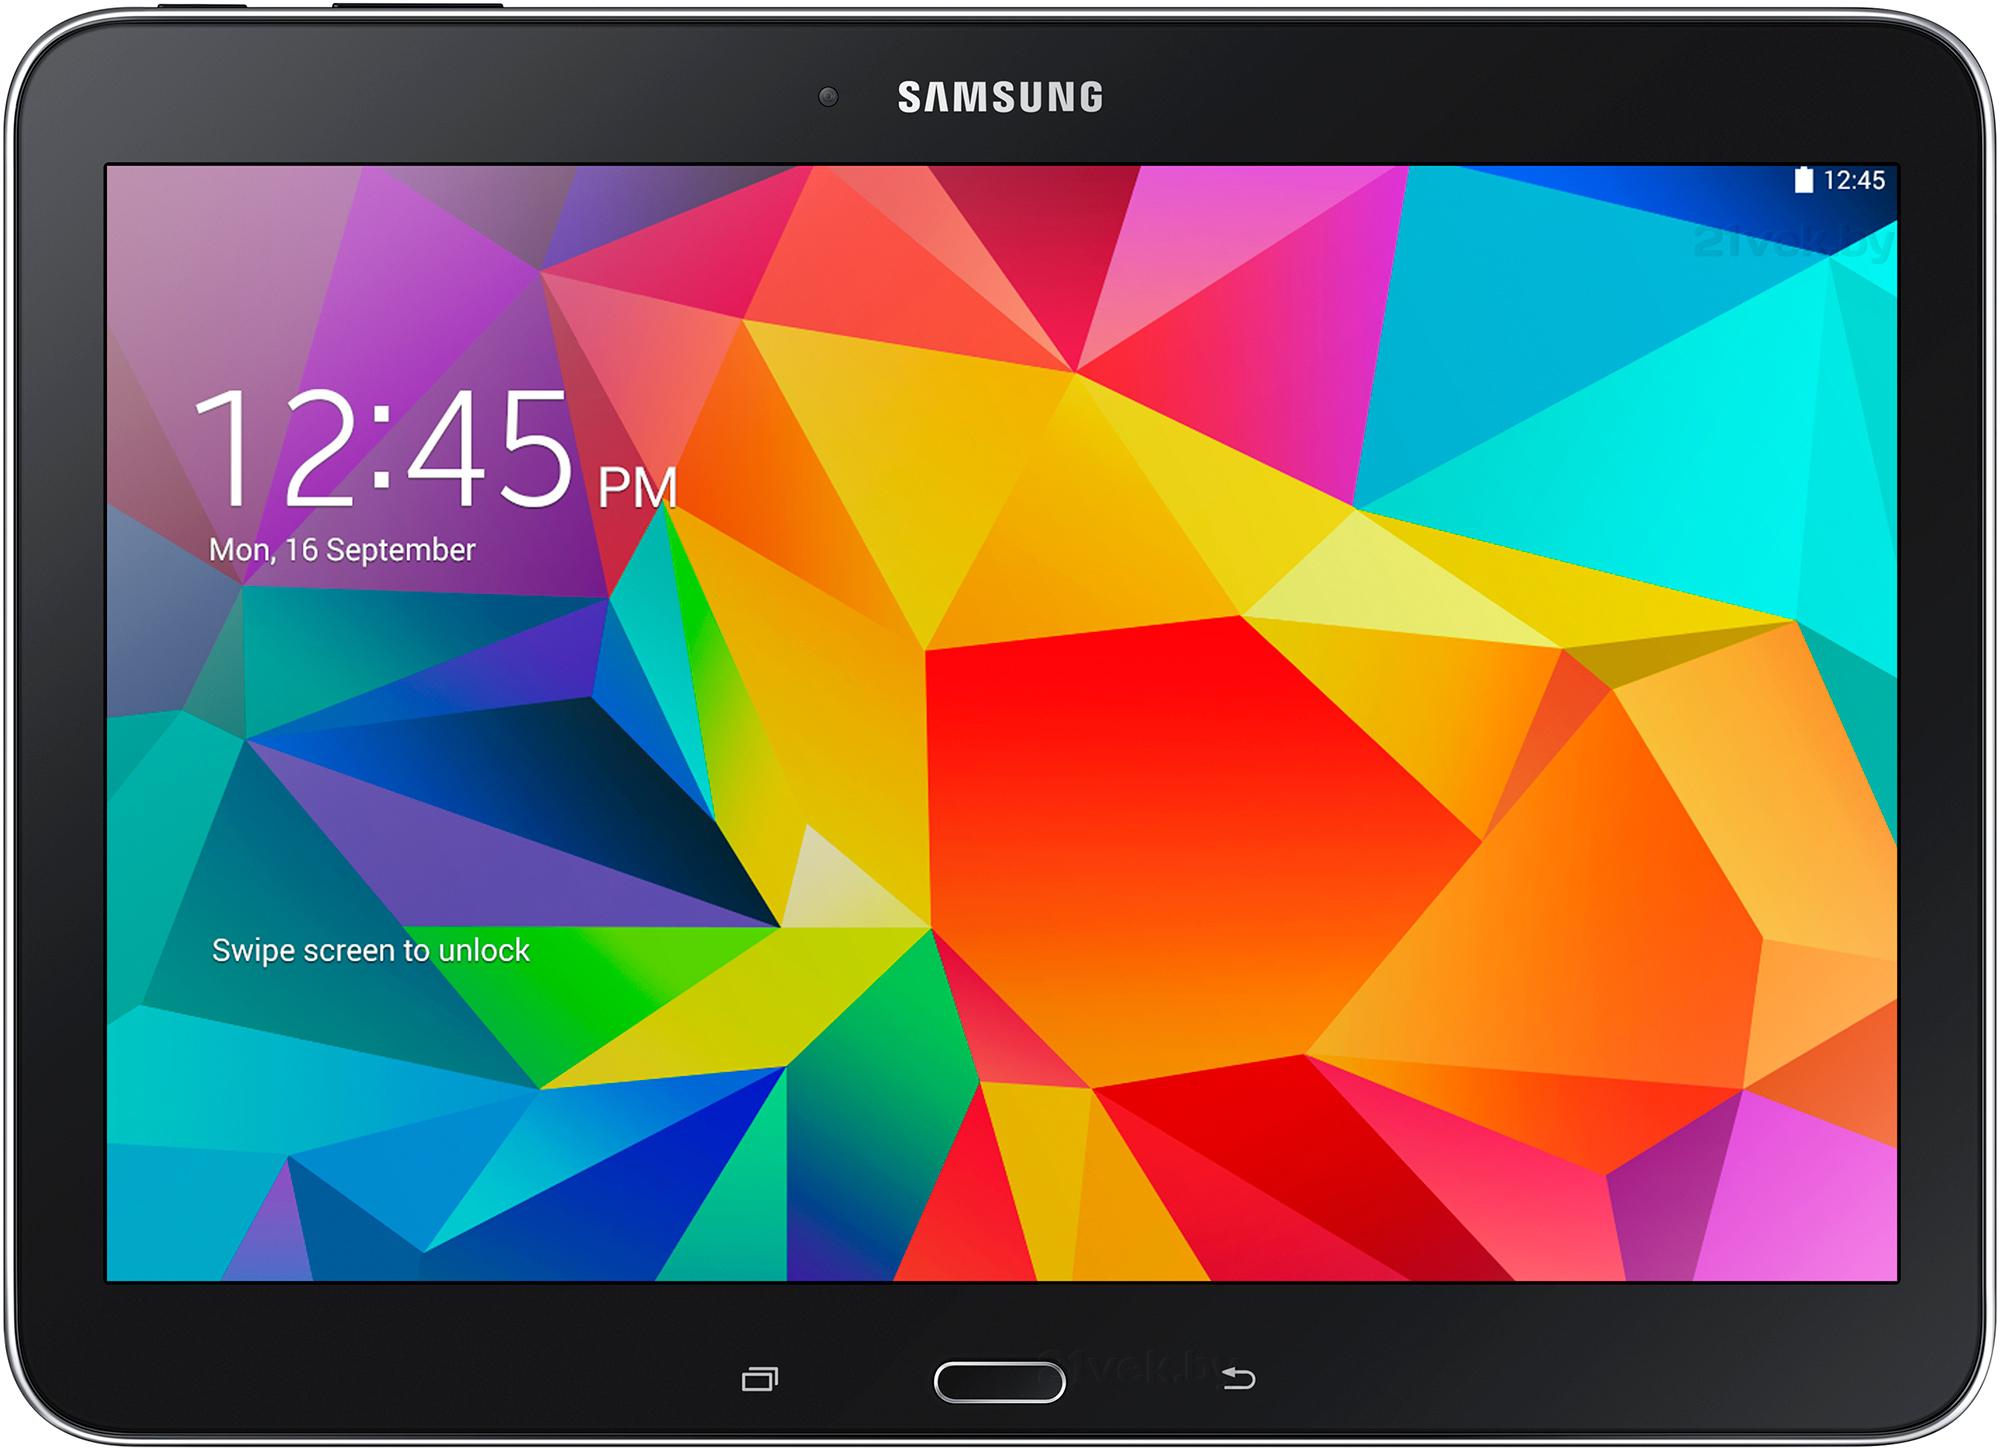 Galaxy Tab 4 10.1 SM–T531 (3G, Black) 21vek.by 4816000.000